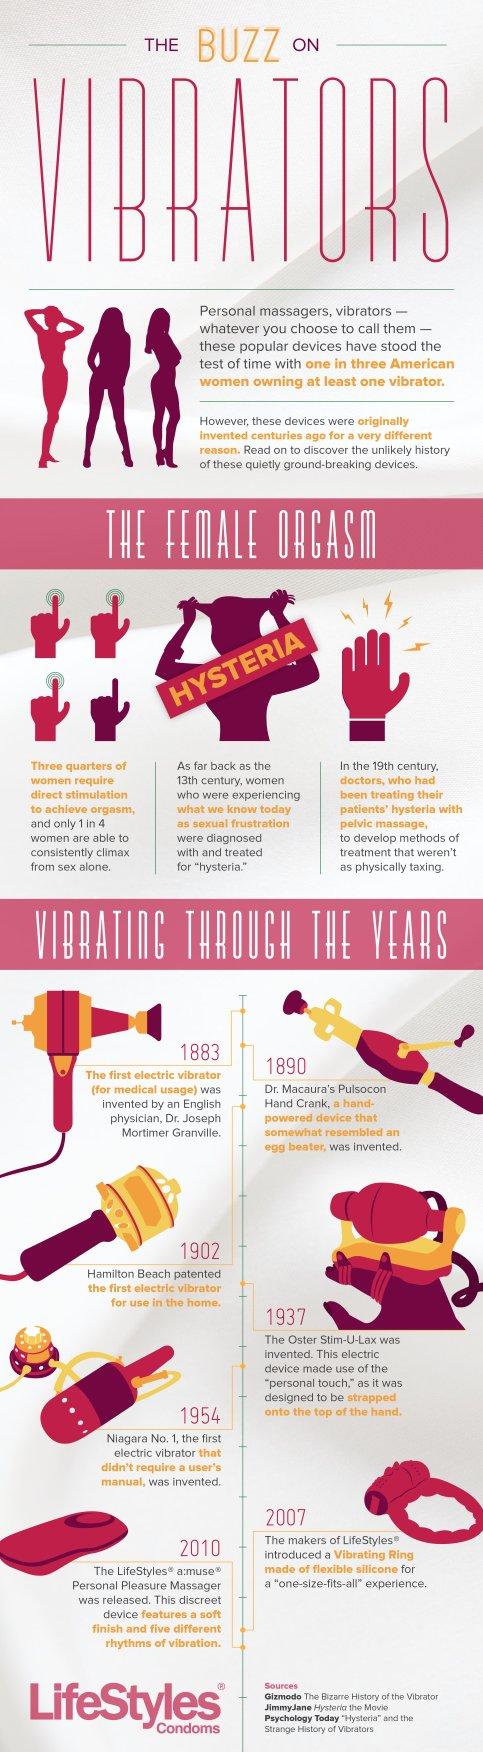 Female Masturbation Facts and Statistics History Image